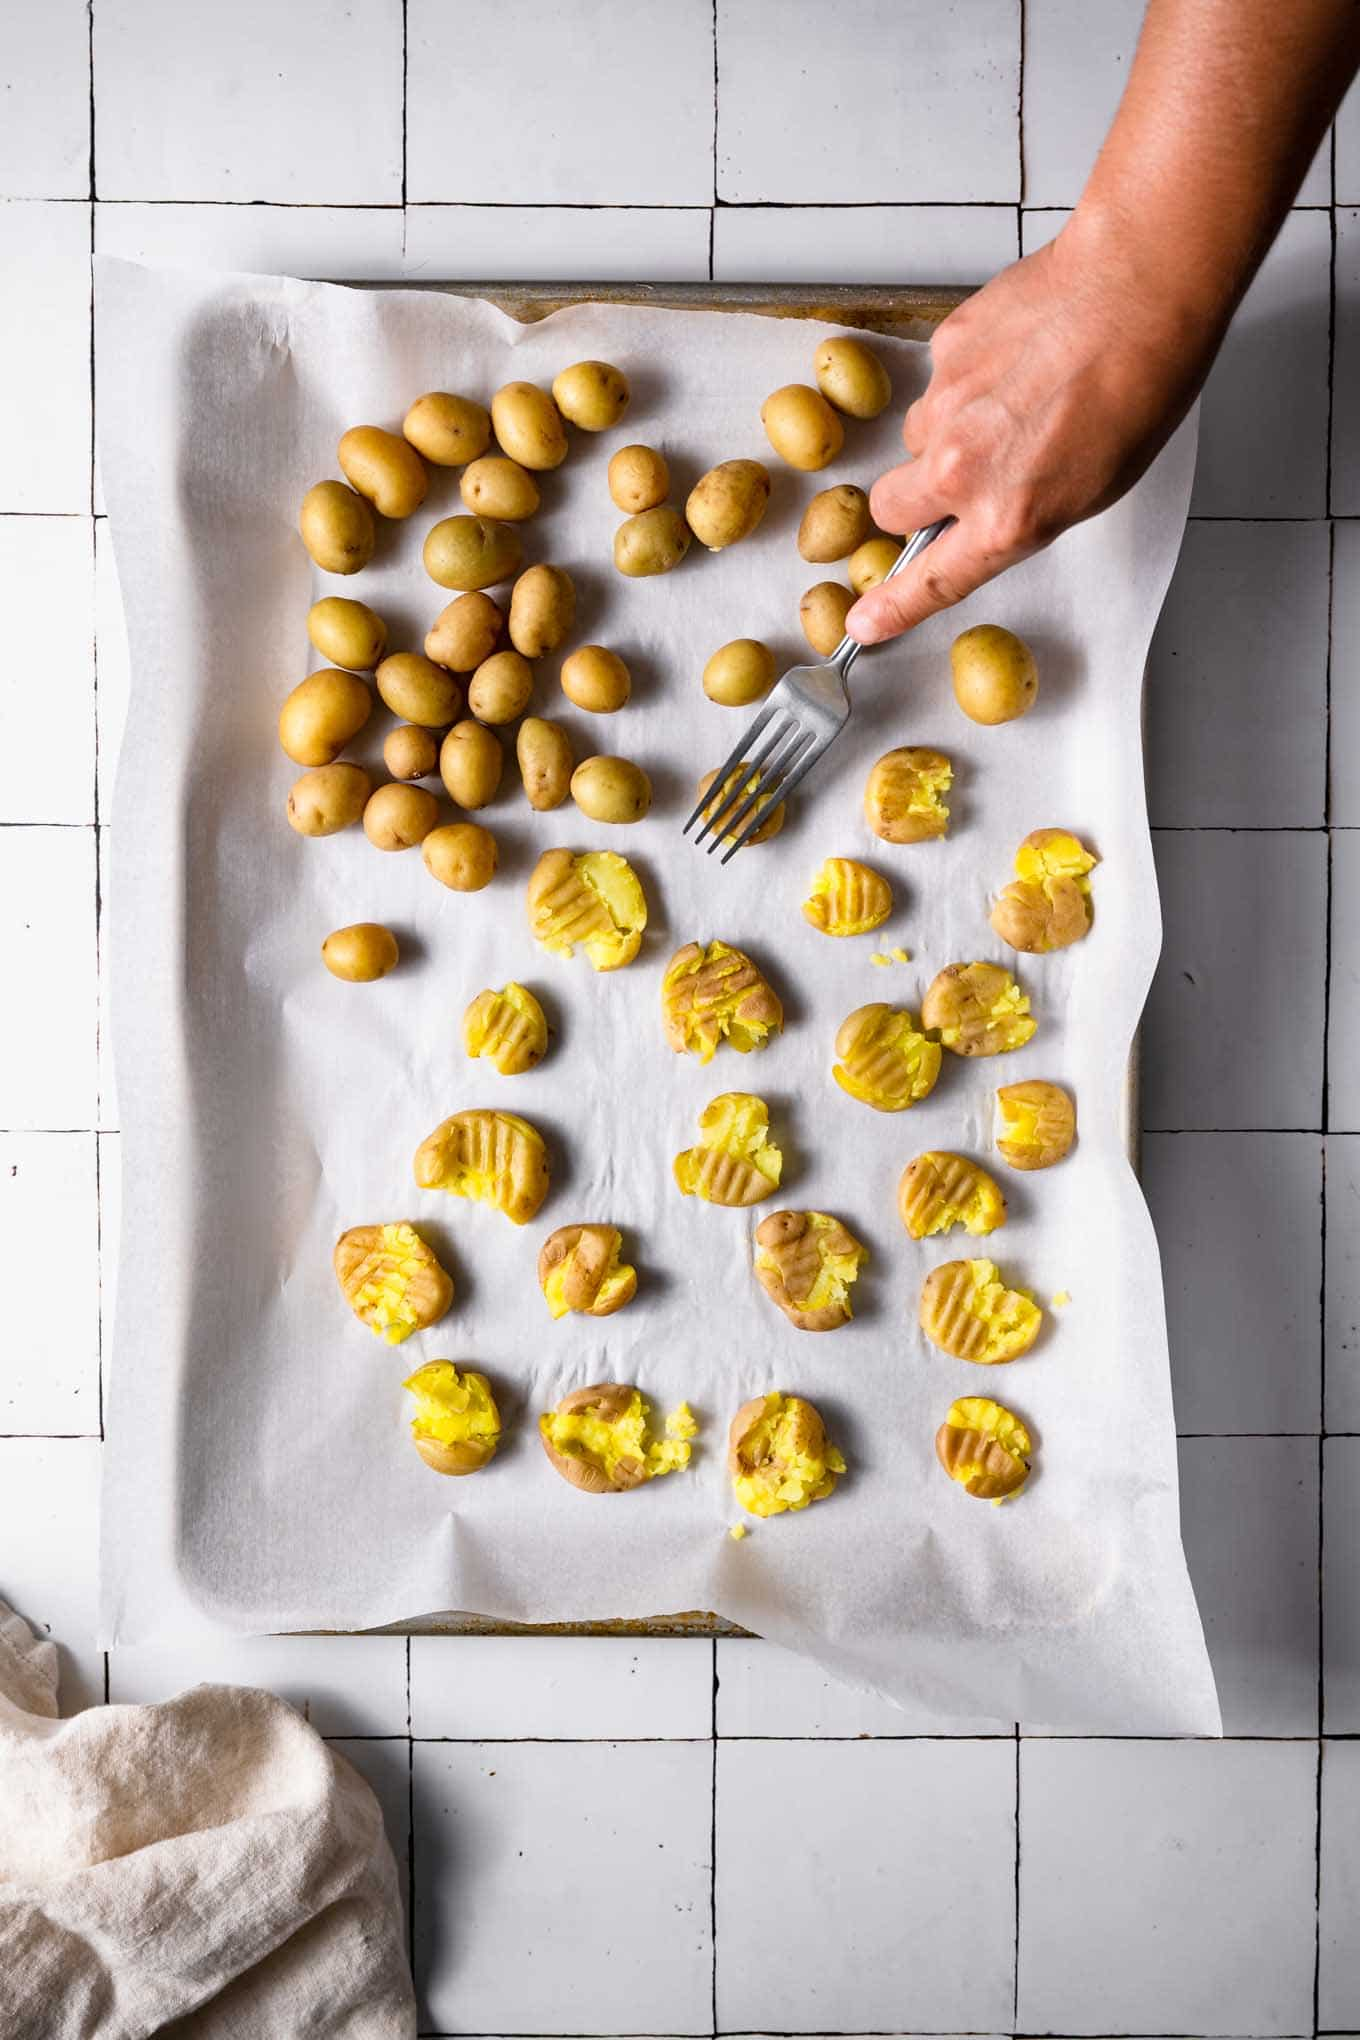 smashing boiled baby potatoes on baking tray